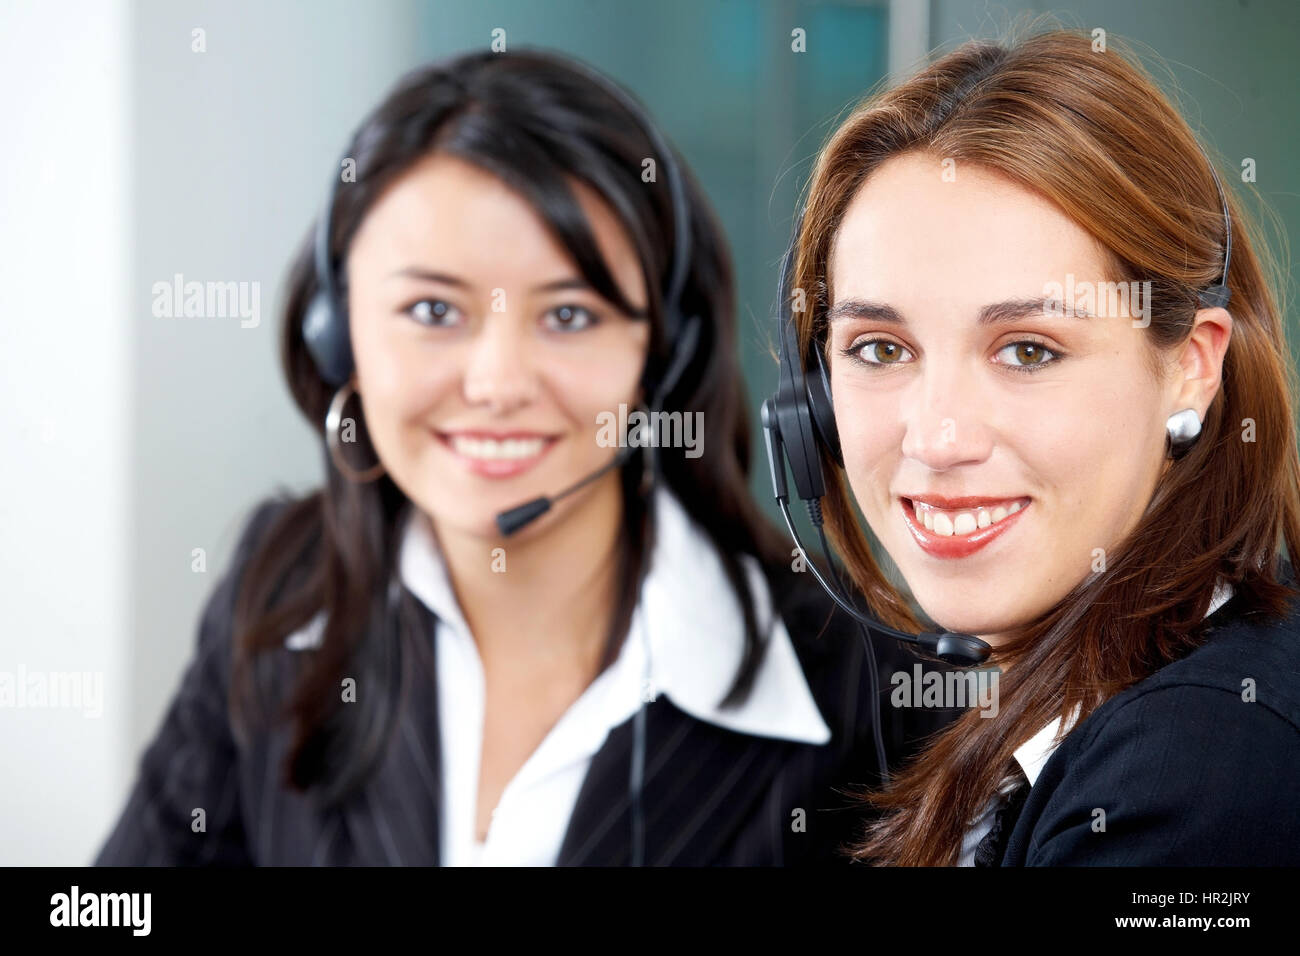 customer service secretaries in an office environment - Stock Image